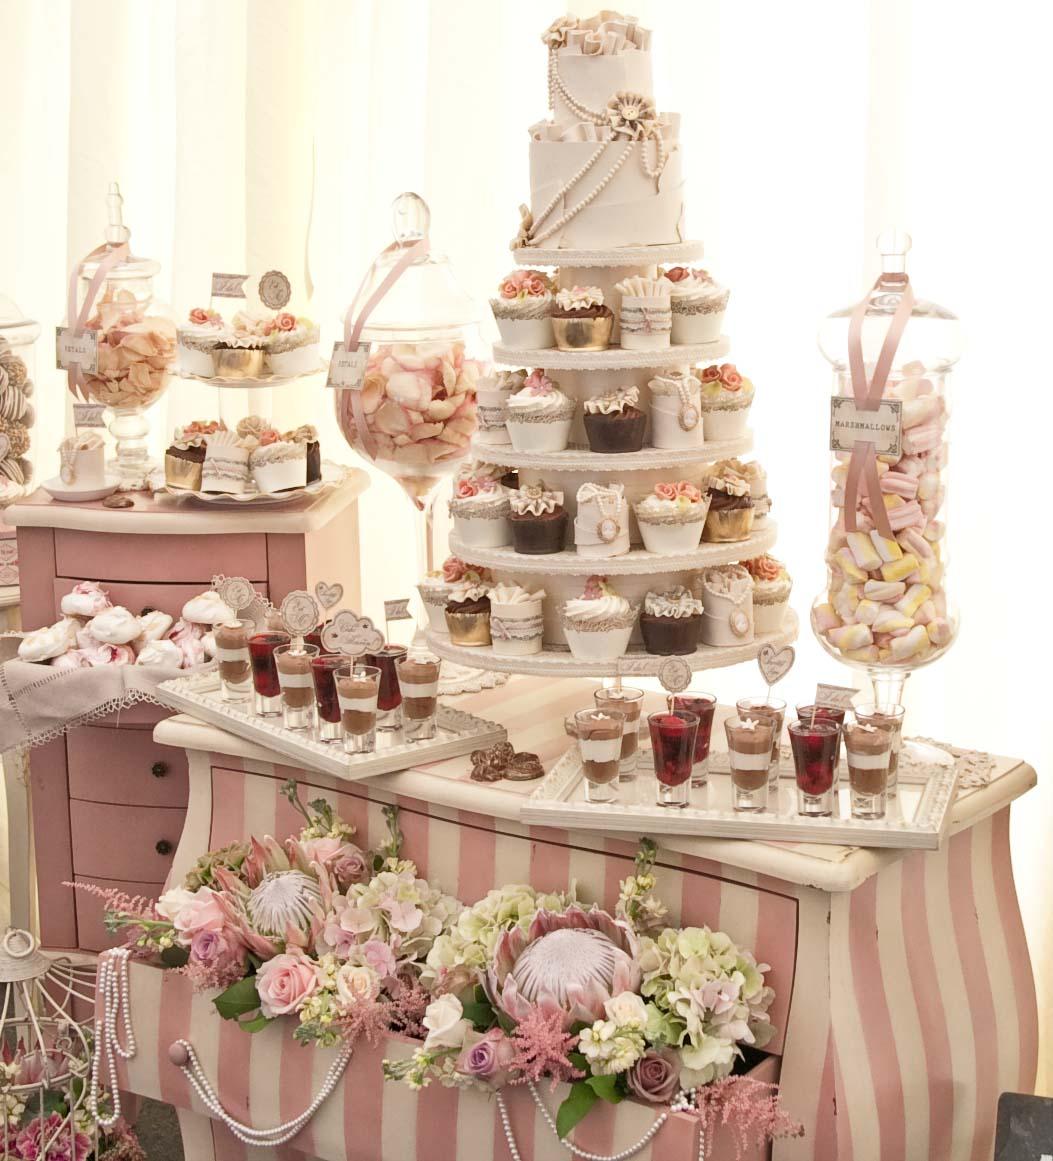 Candy Table Wedding Ideas: Candies Carts, Vintage Wedding Cake, Wedding Invitations